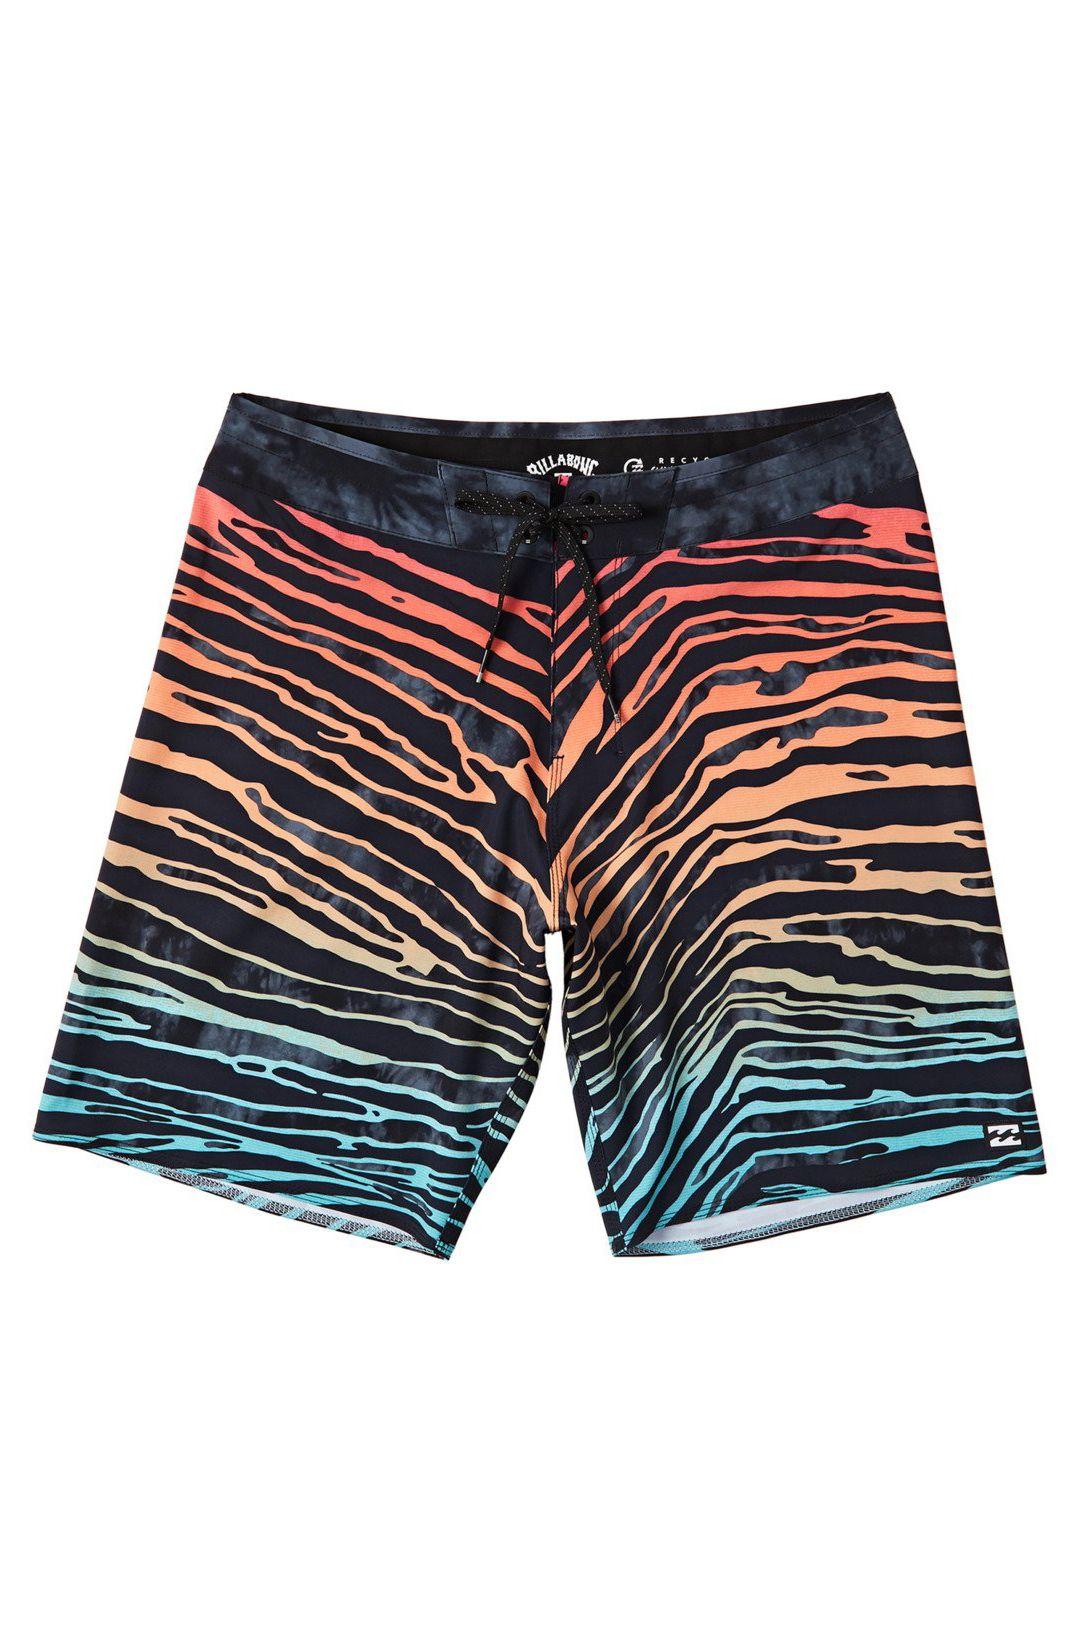 Boardshorts Billabong SUNDAYS PRO Neon